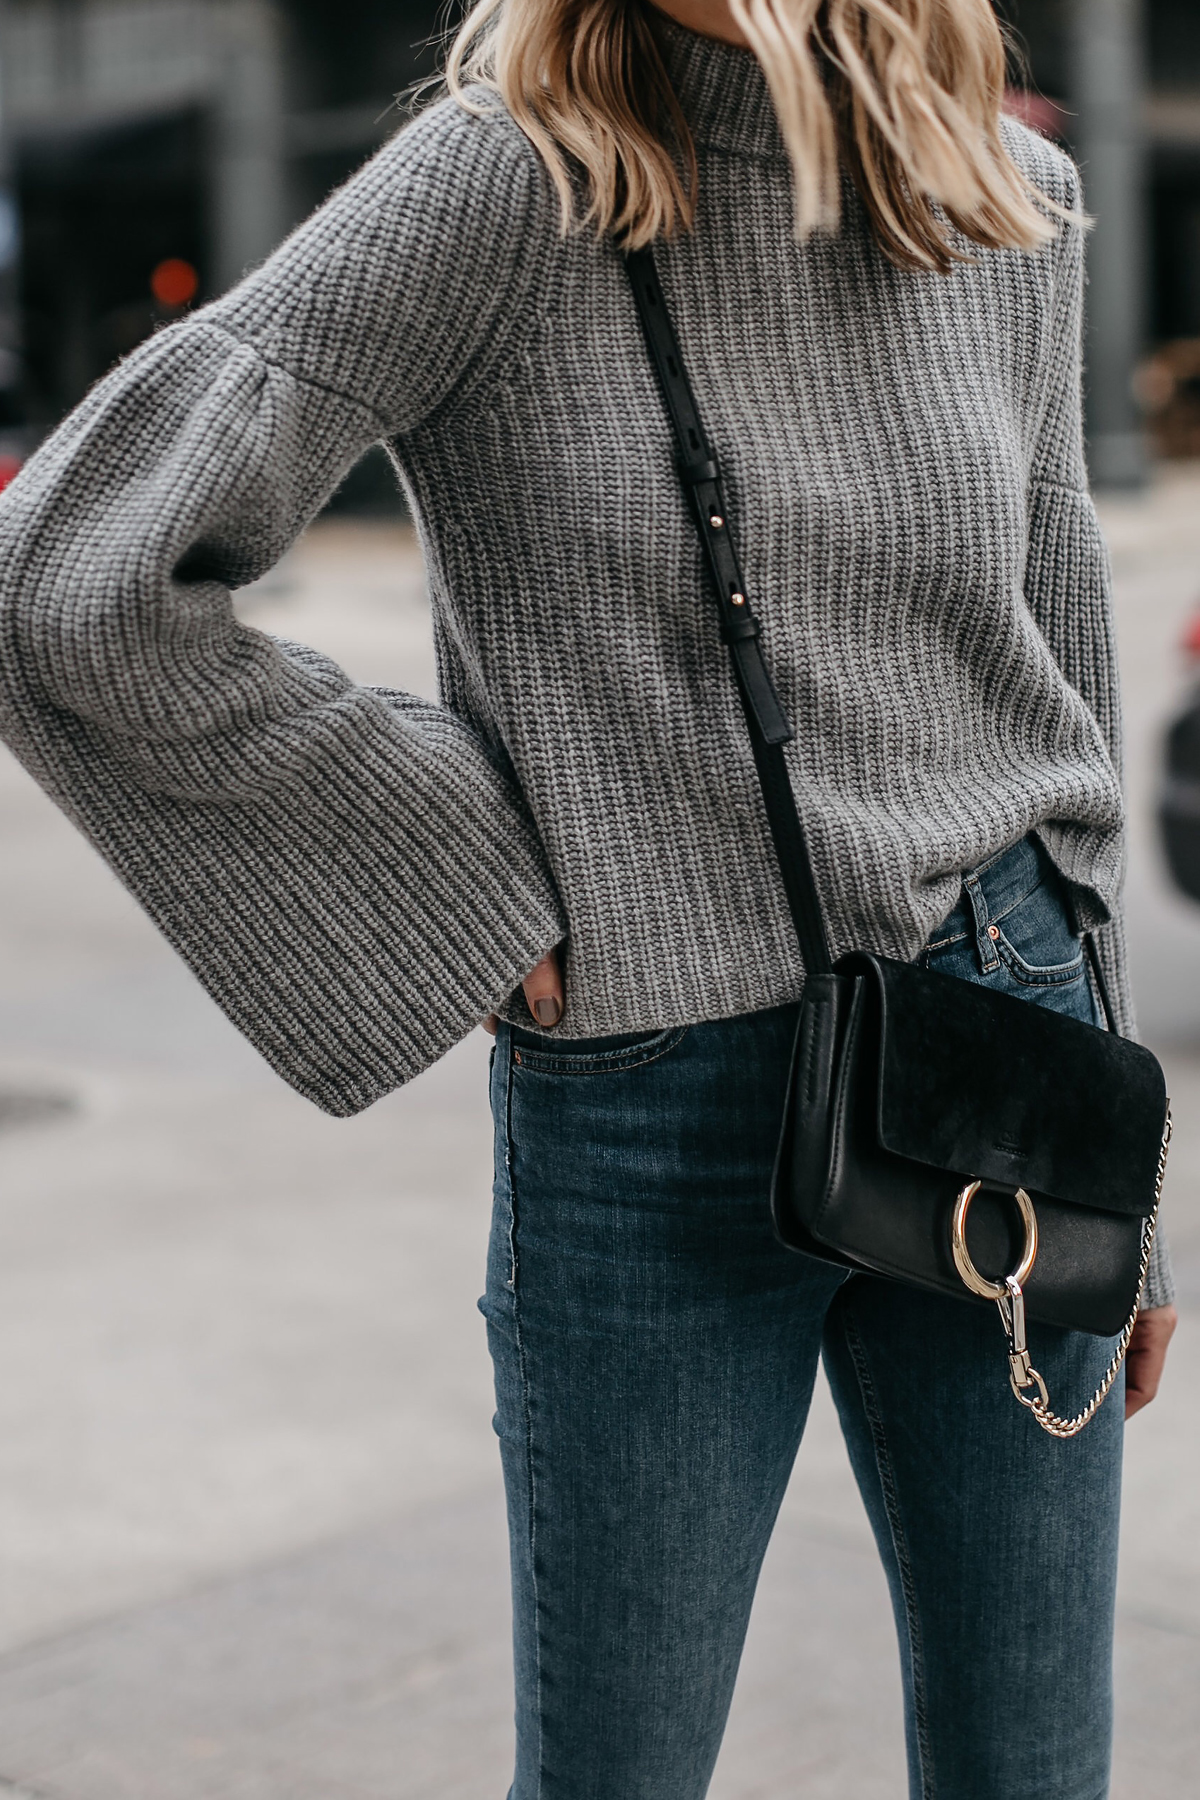 Grey Bell Sleeve Sweater Chloe Faye Black Handbag Fashion Jackson Dallas Blogger Fashion Blogger Street Style